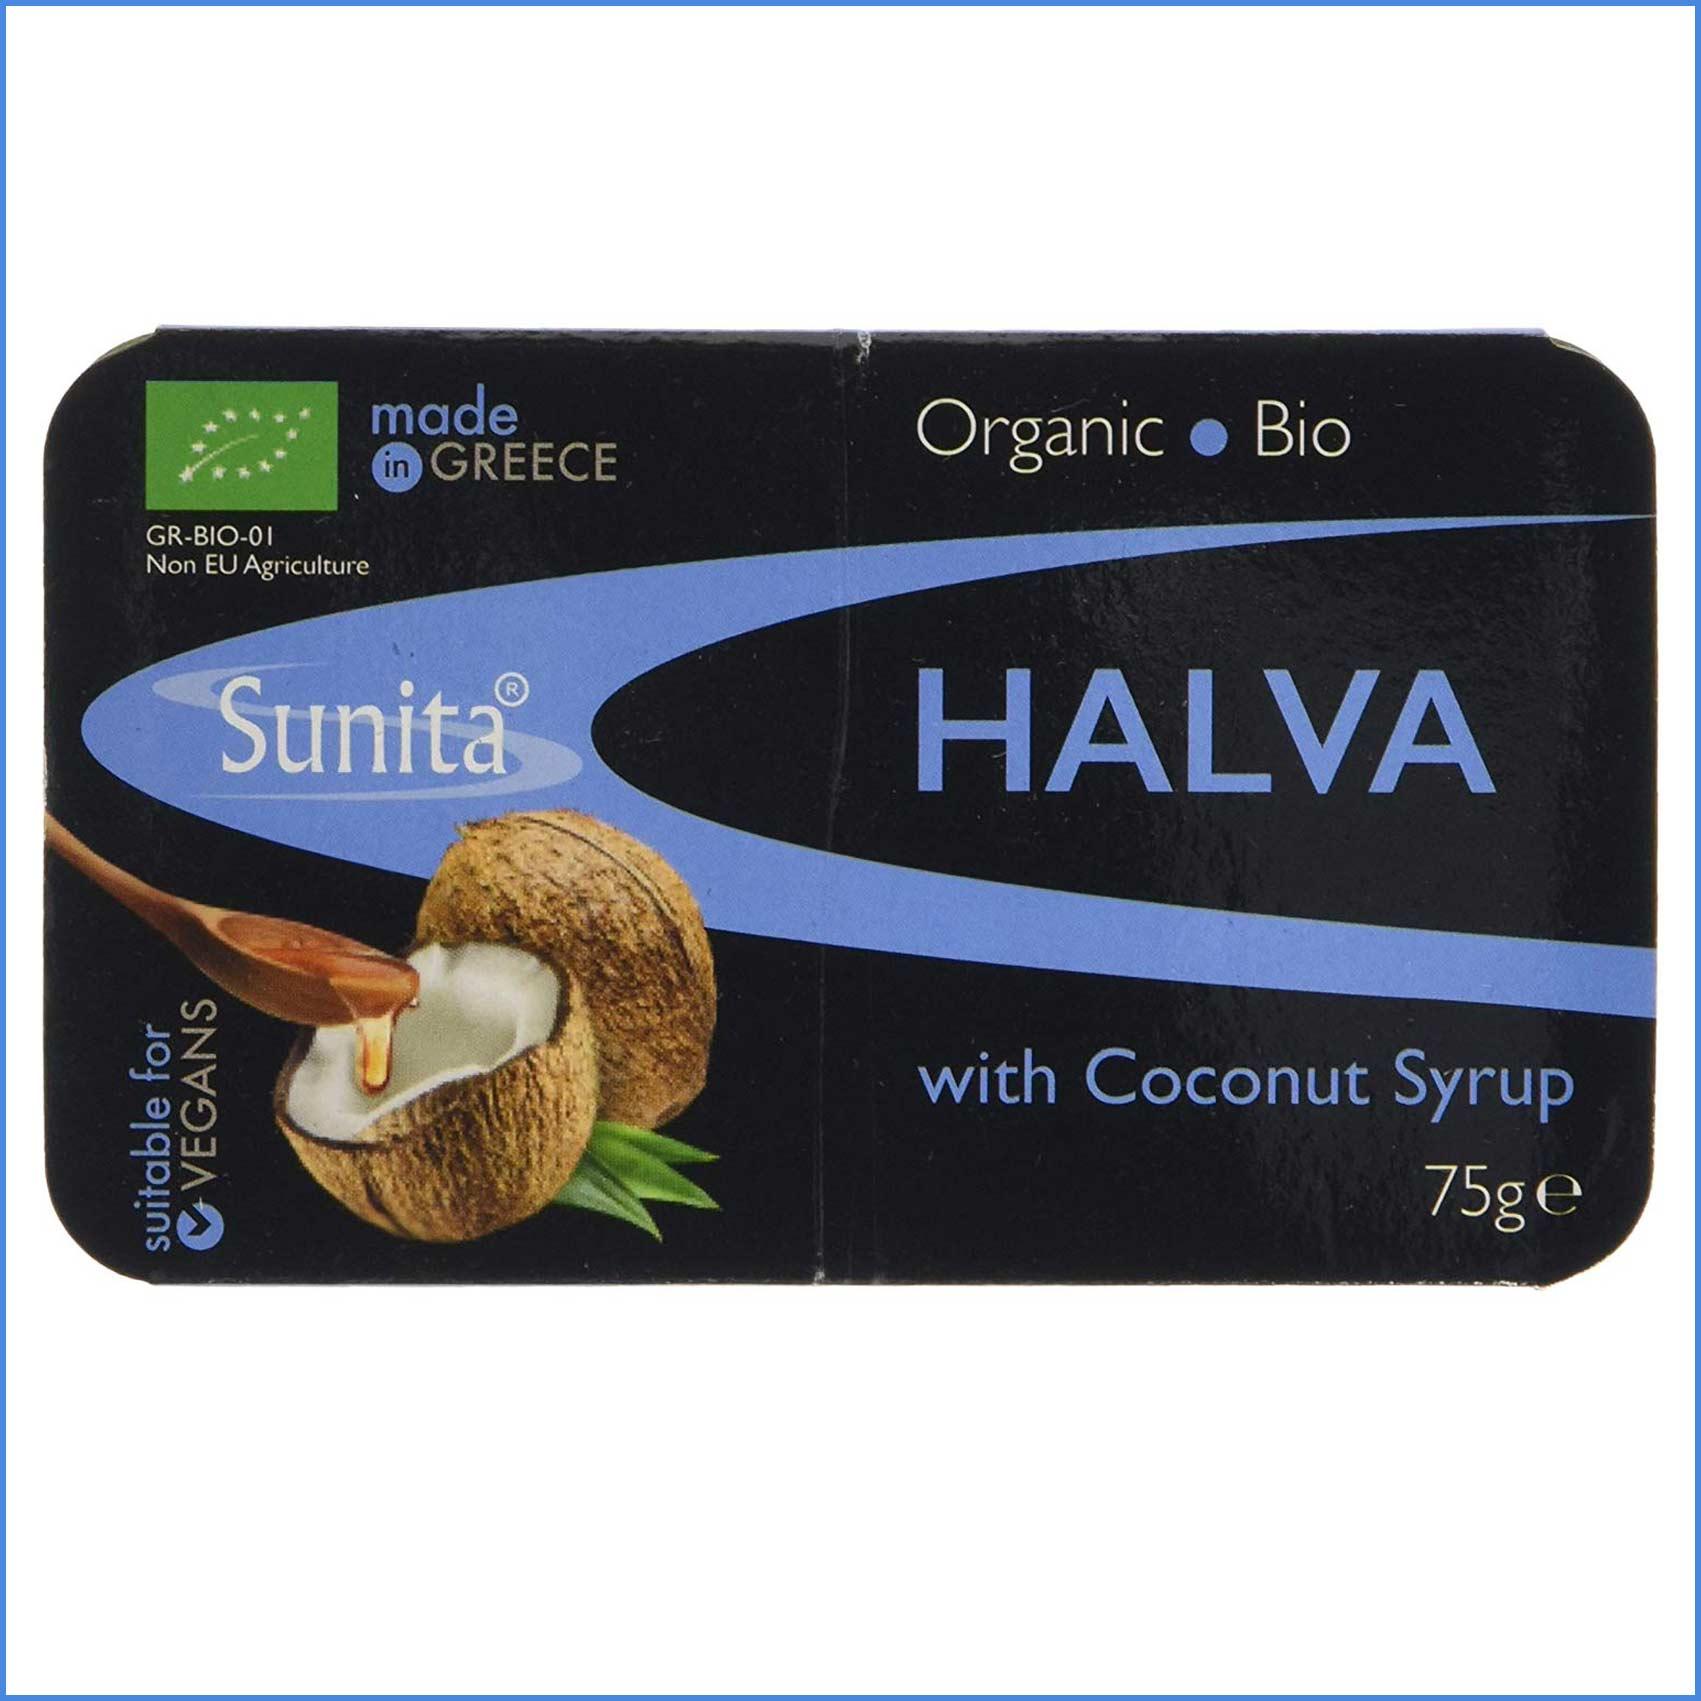 Organic Halva with Coconut Syrup 75g